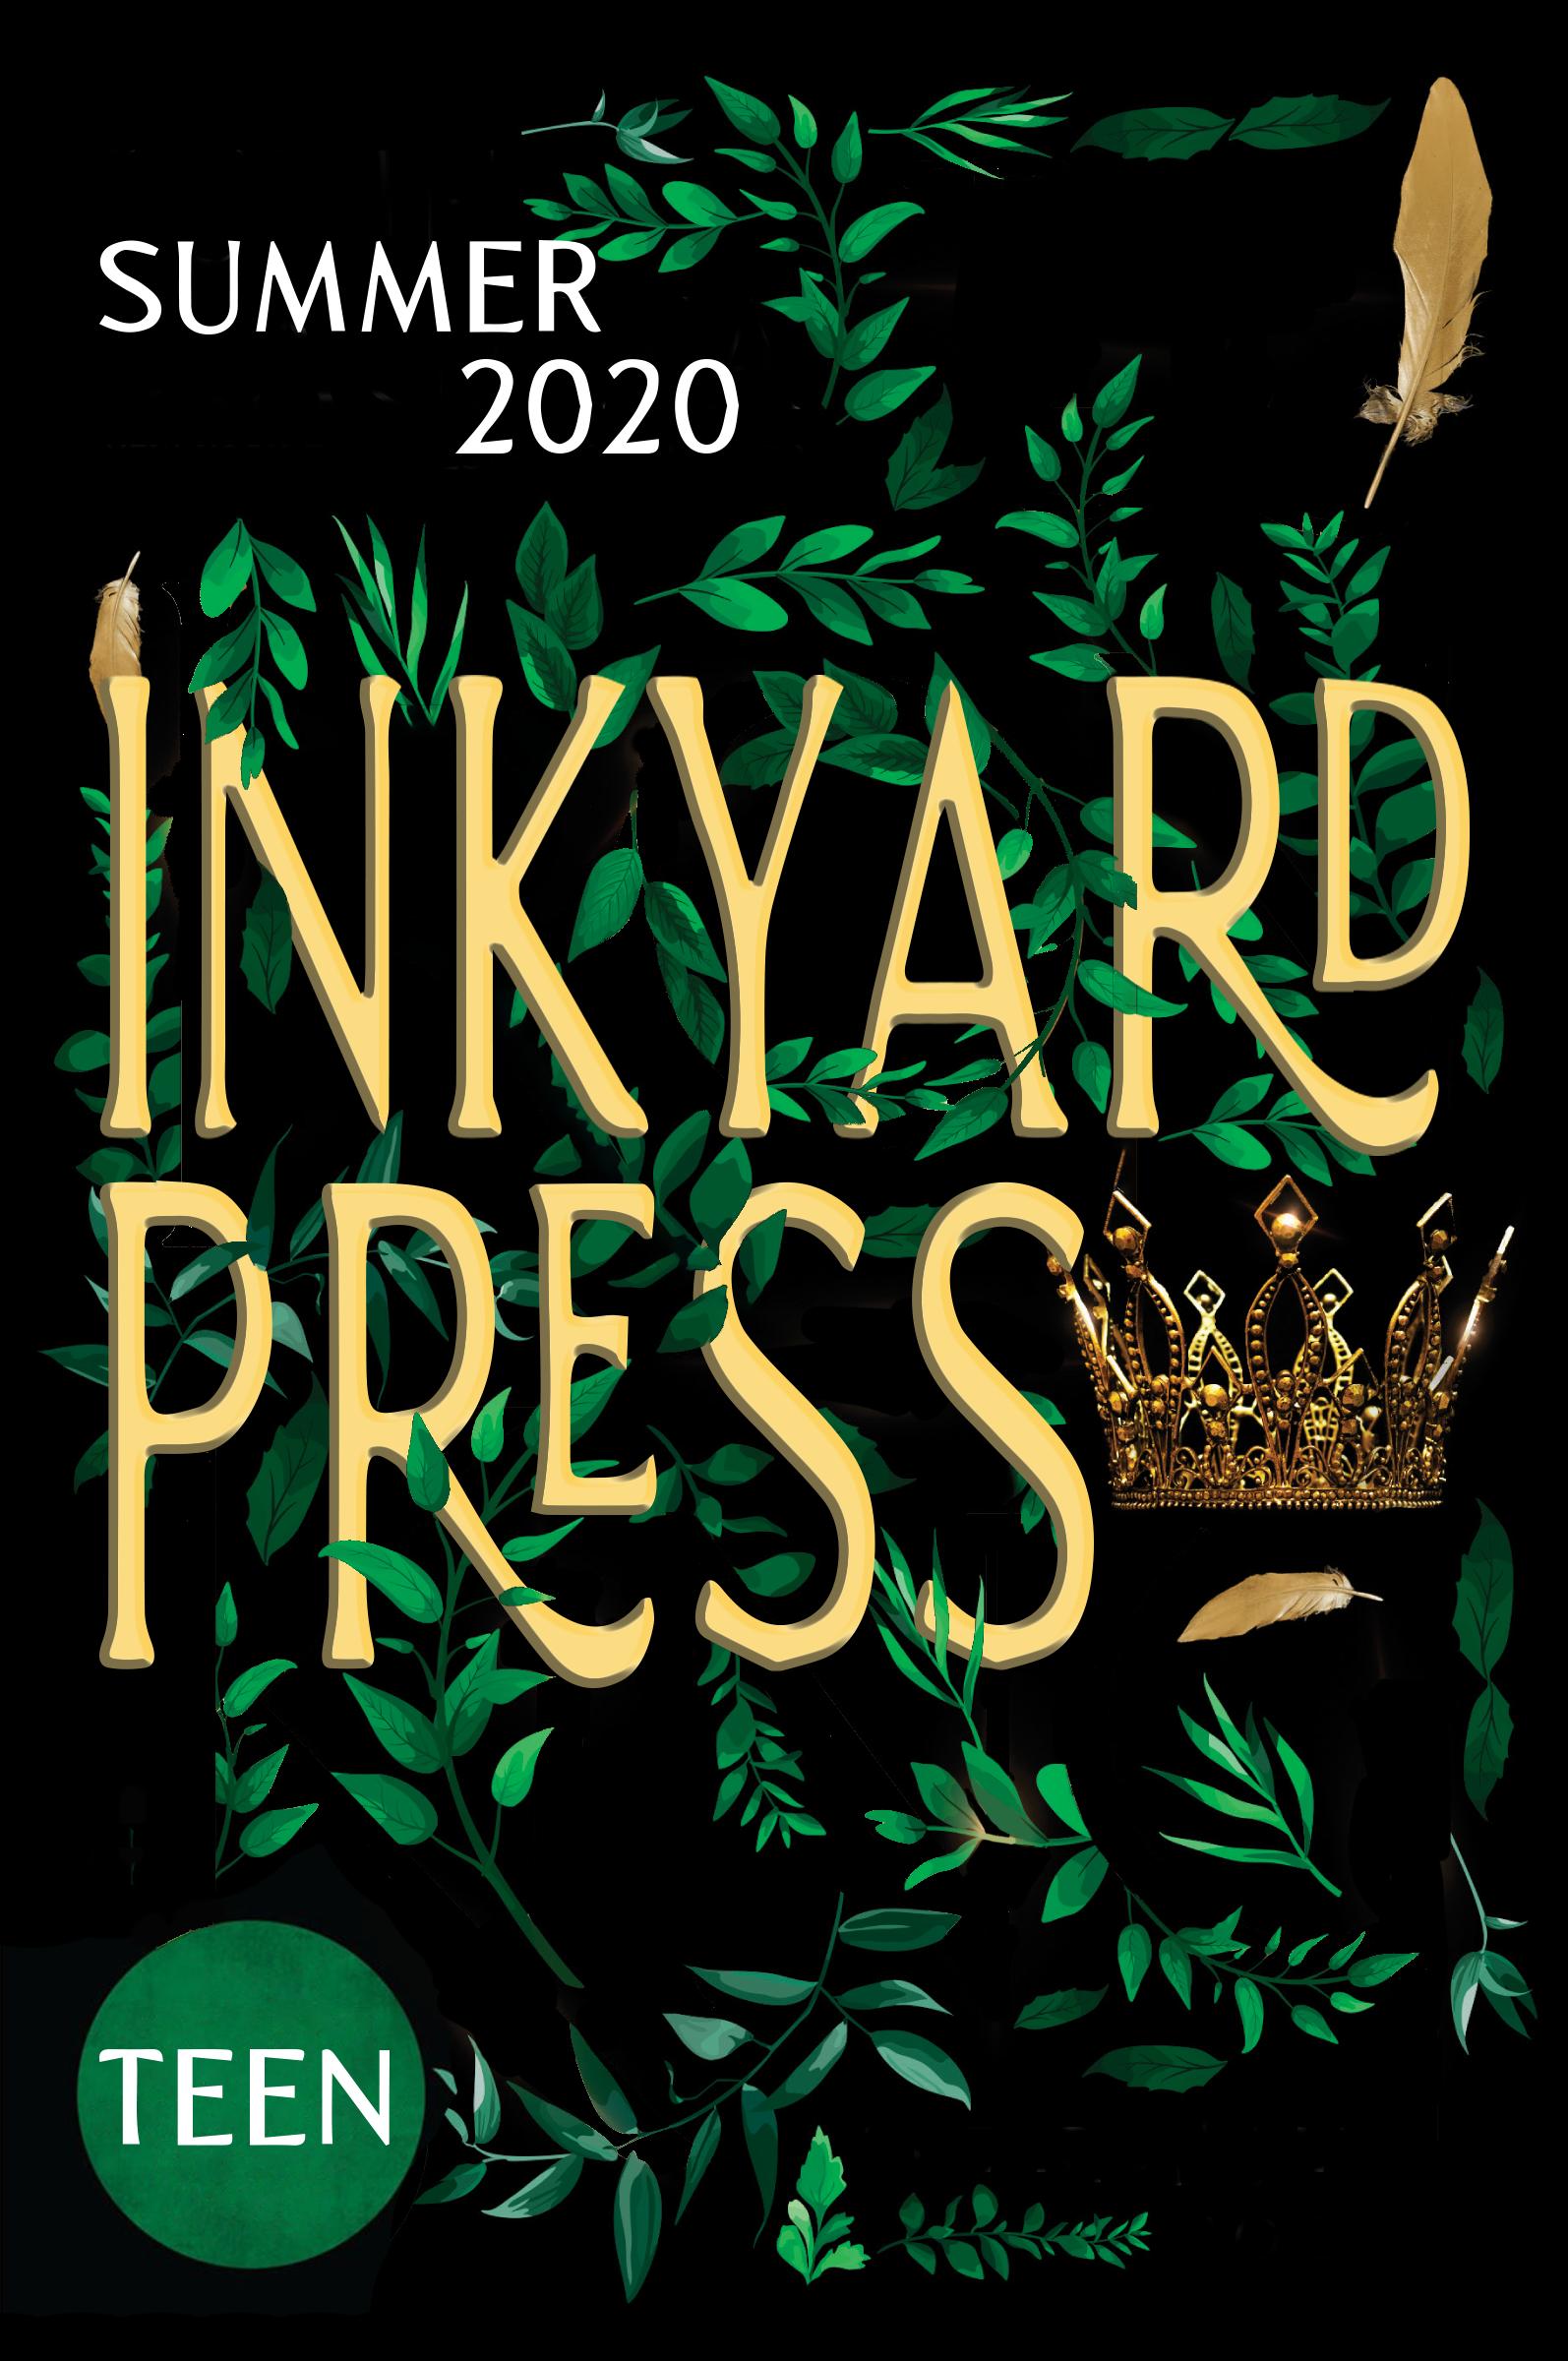 S20 INKYARD PRESS